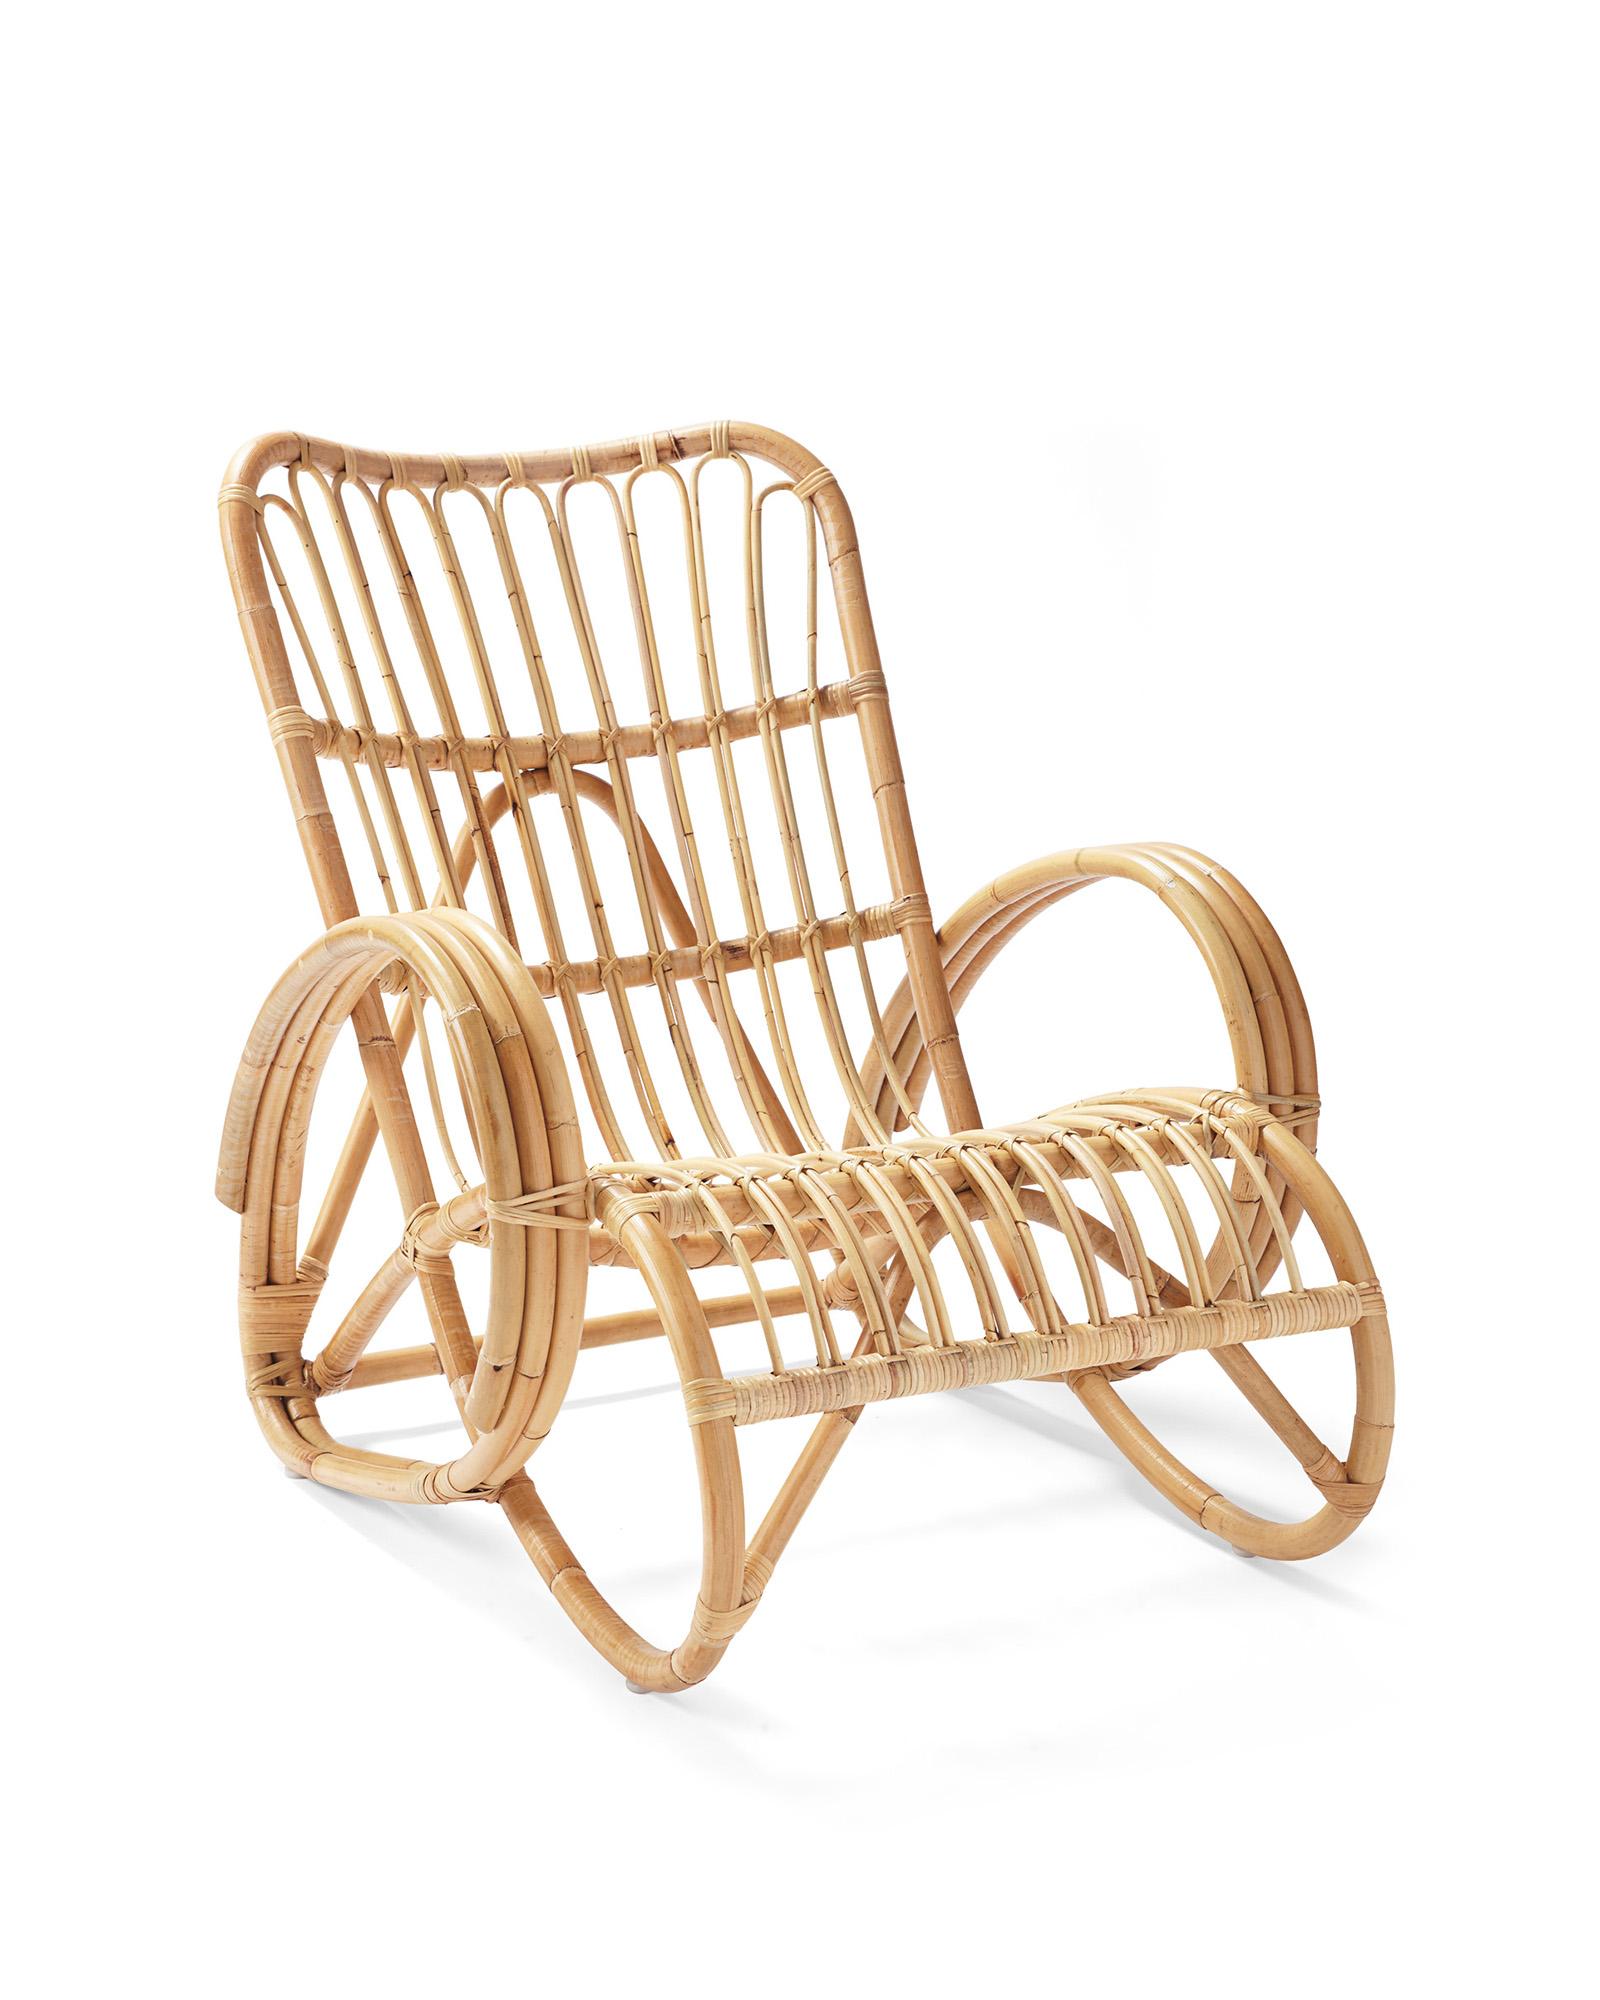 Rattan Chairs  65